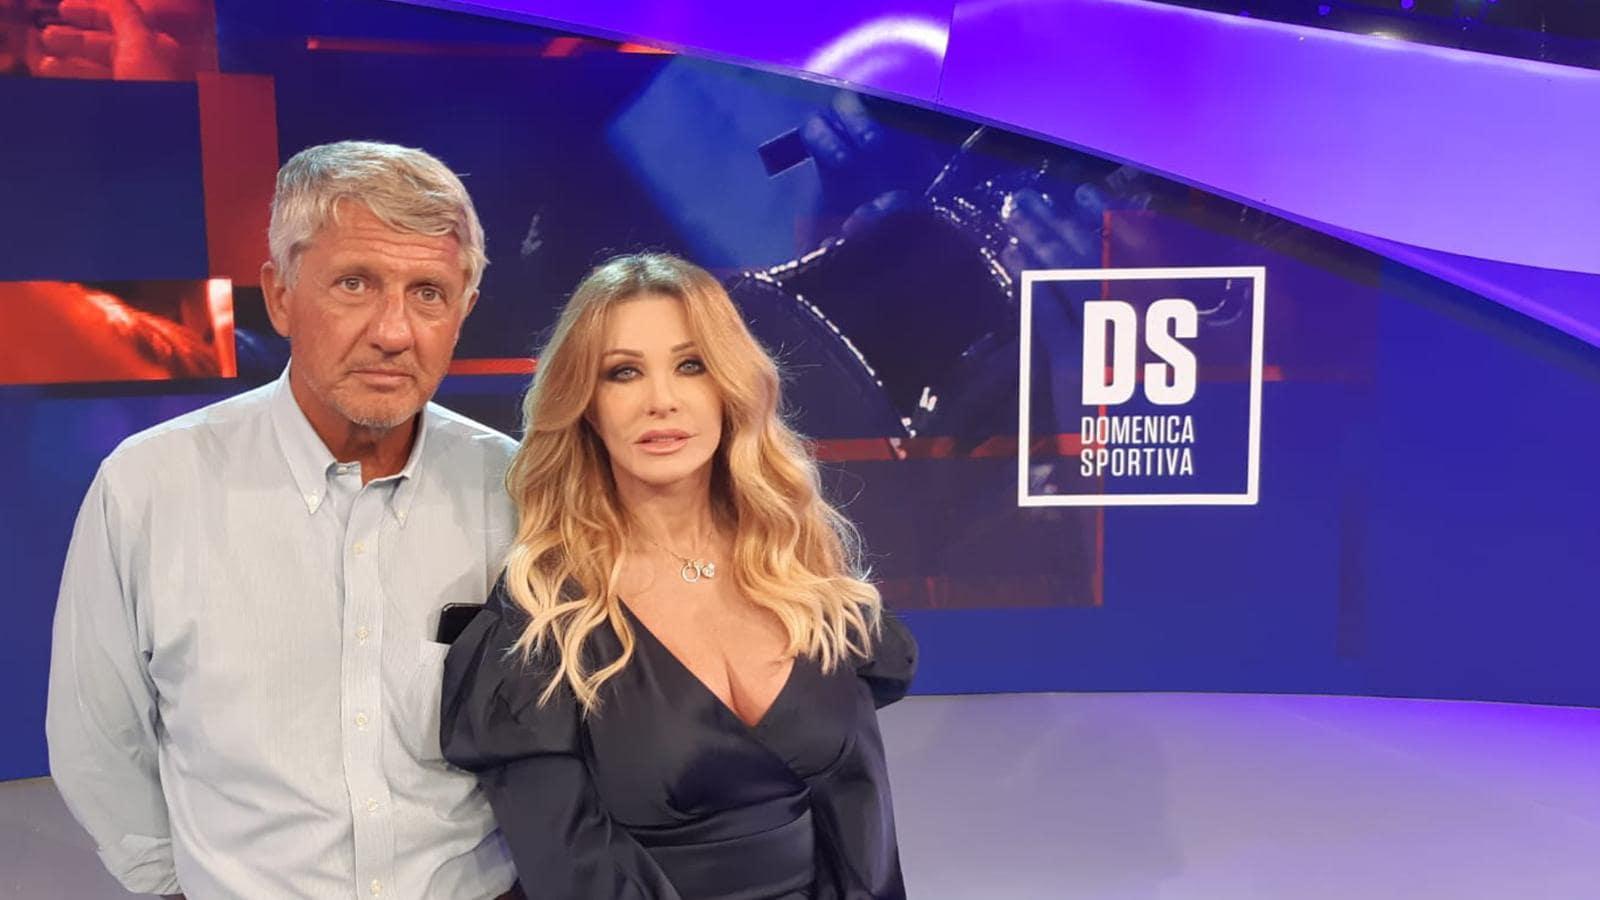 Paola Ferrari Che soddisfazione battere Wanda Nara